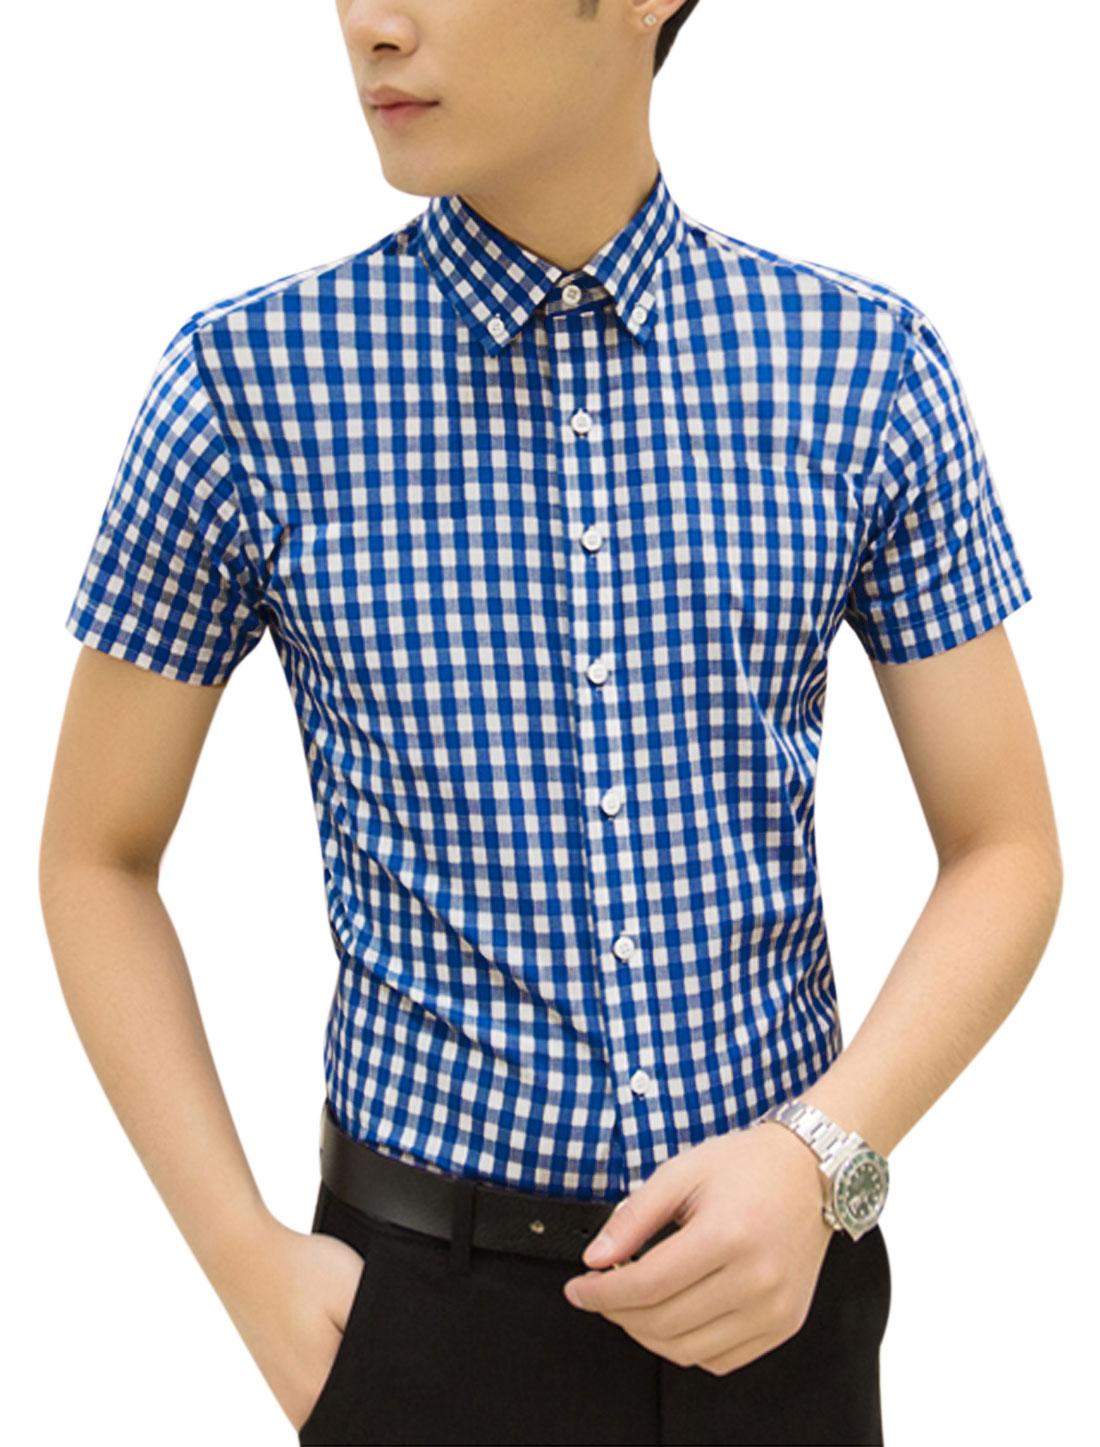 Man Plaids Short Sleeves Button Fastening Casual Top Shirt Dark Blue White M